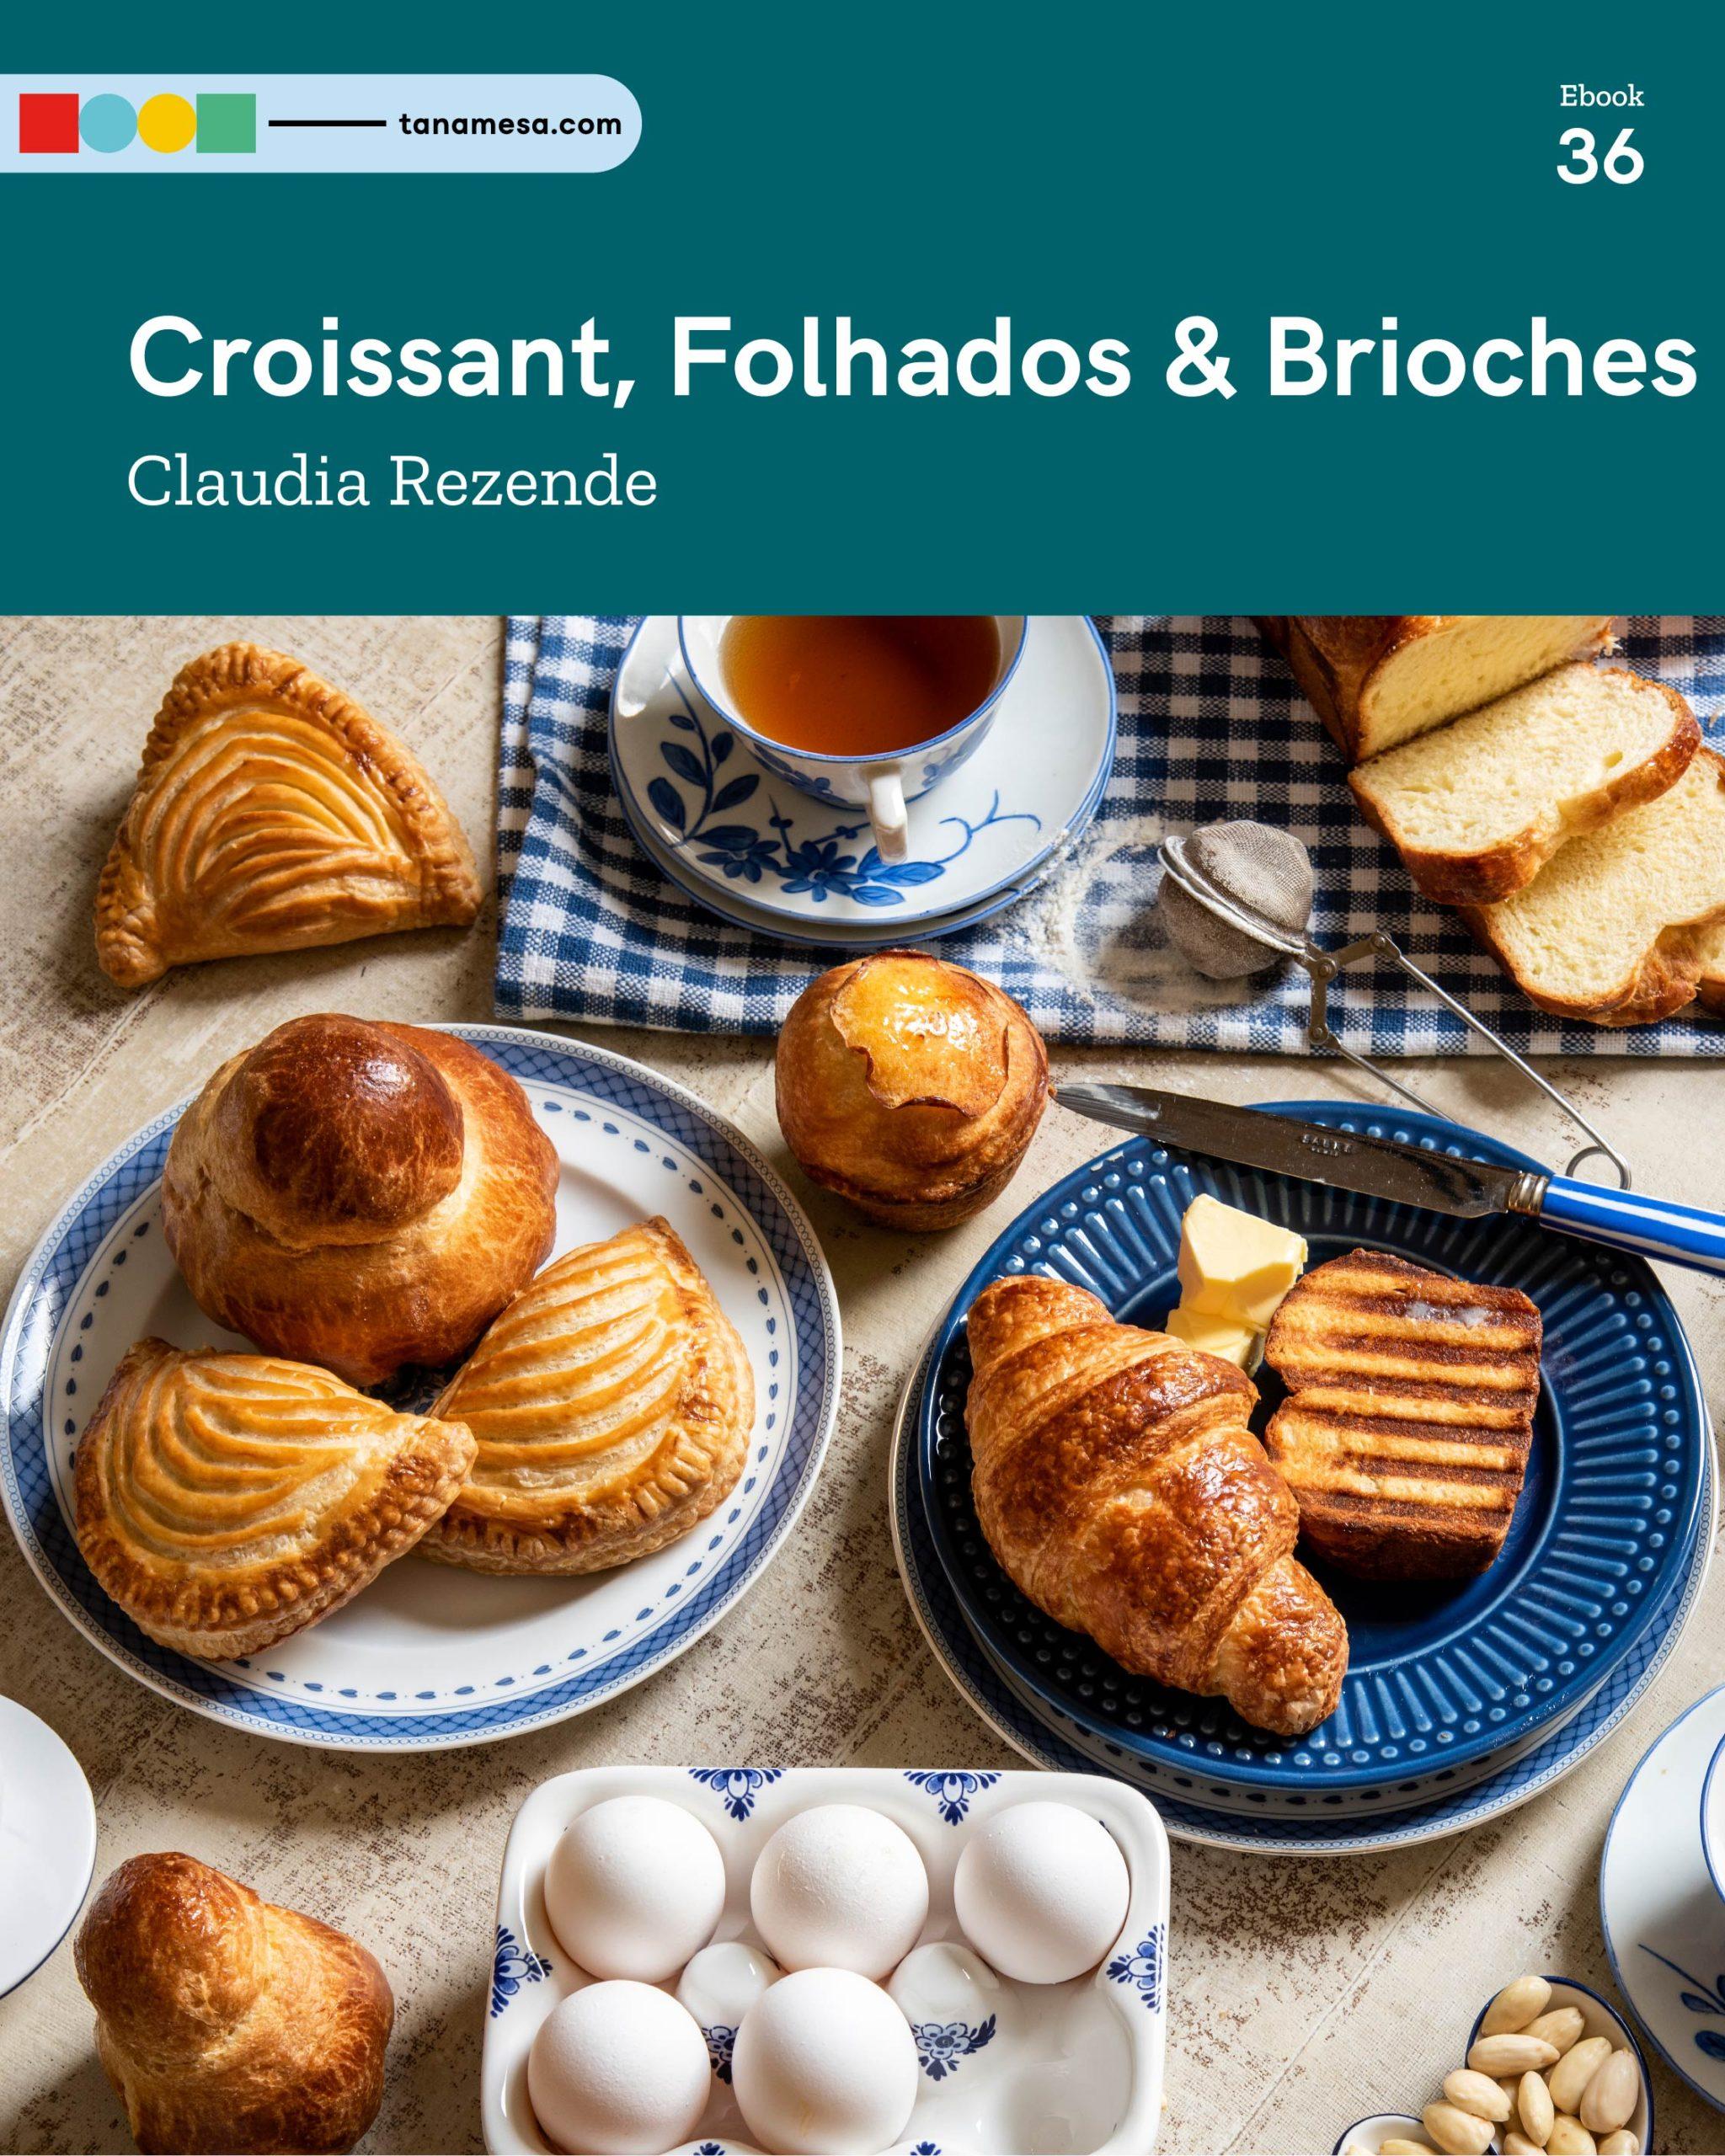 Croissant, Folhados e Brioches